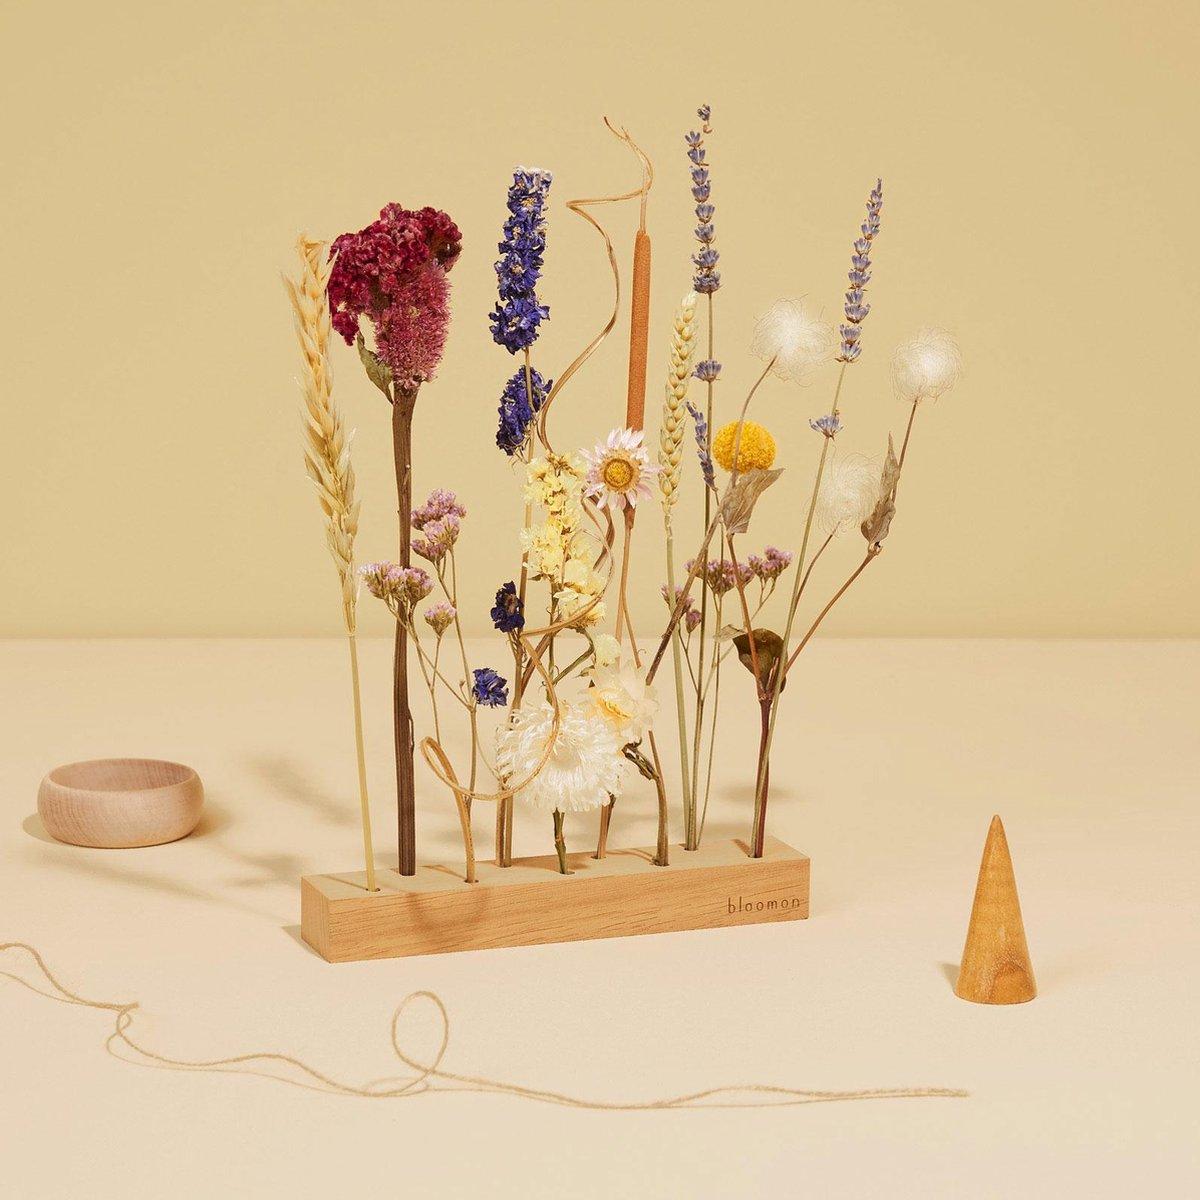 bloomon   Flowergram   Floral Picnic   Unieke brievenbus droogbloemen